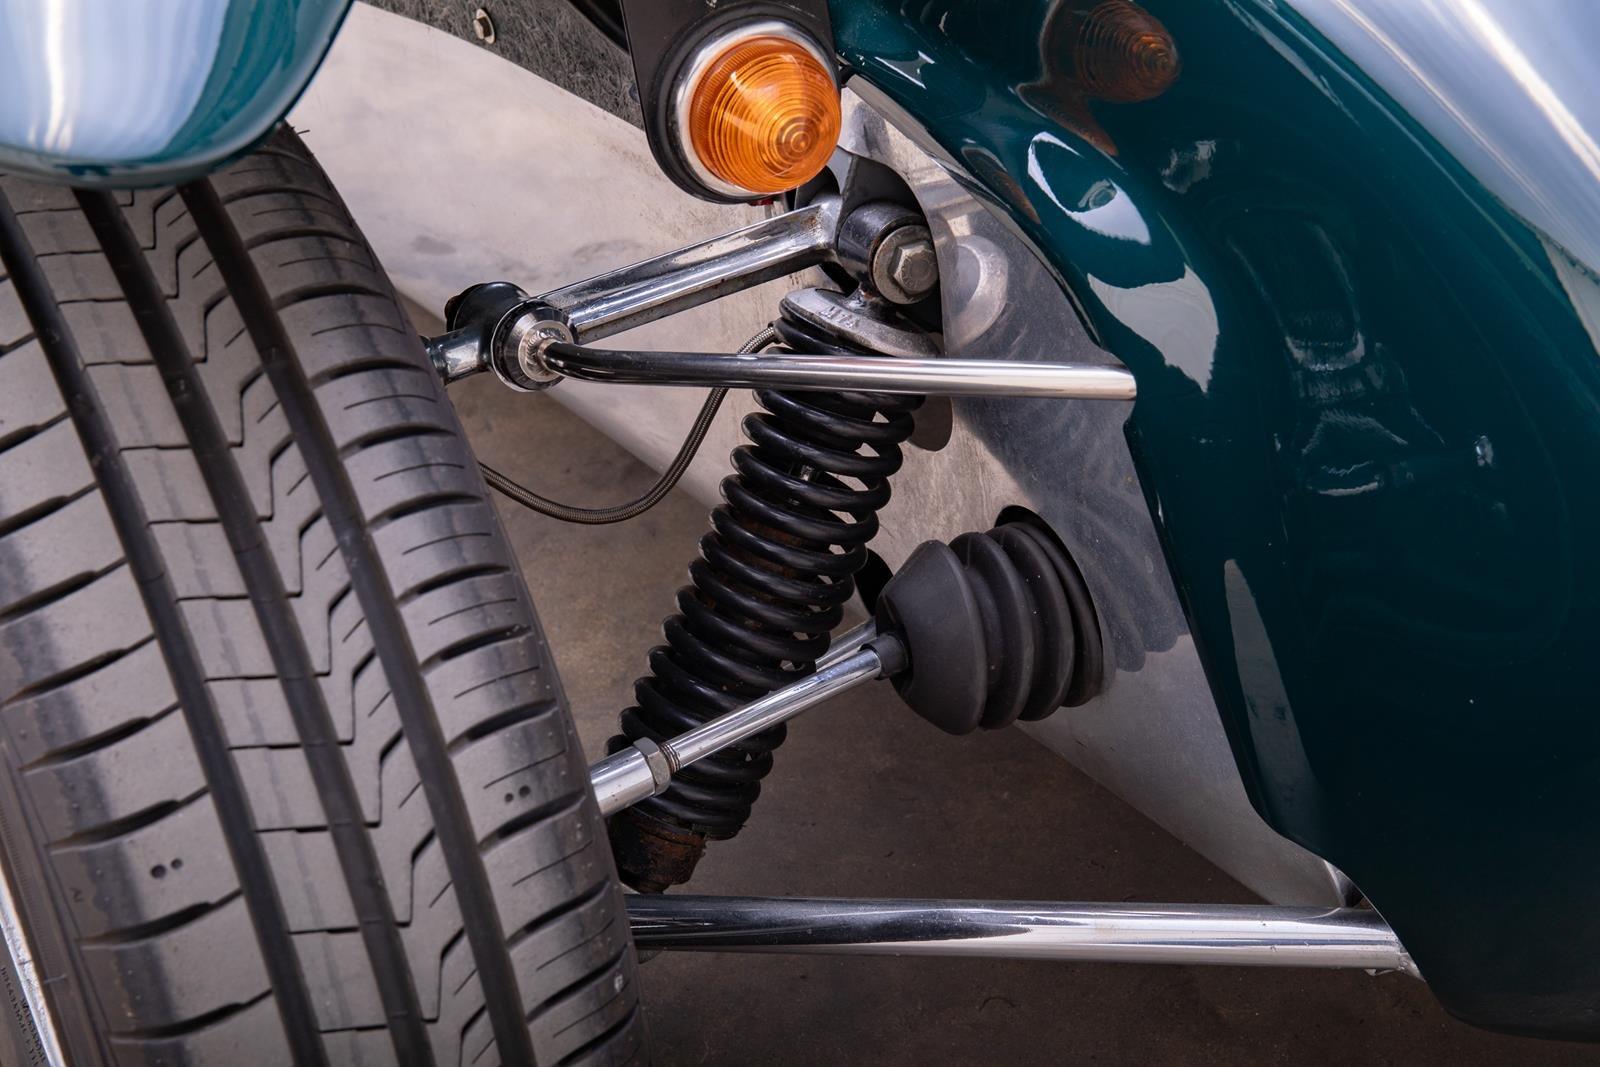 Lotus Super Seven S2 Cosworth 1964 For Sale (picture 3 of 6)